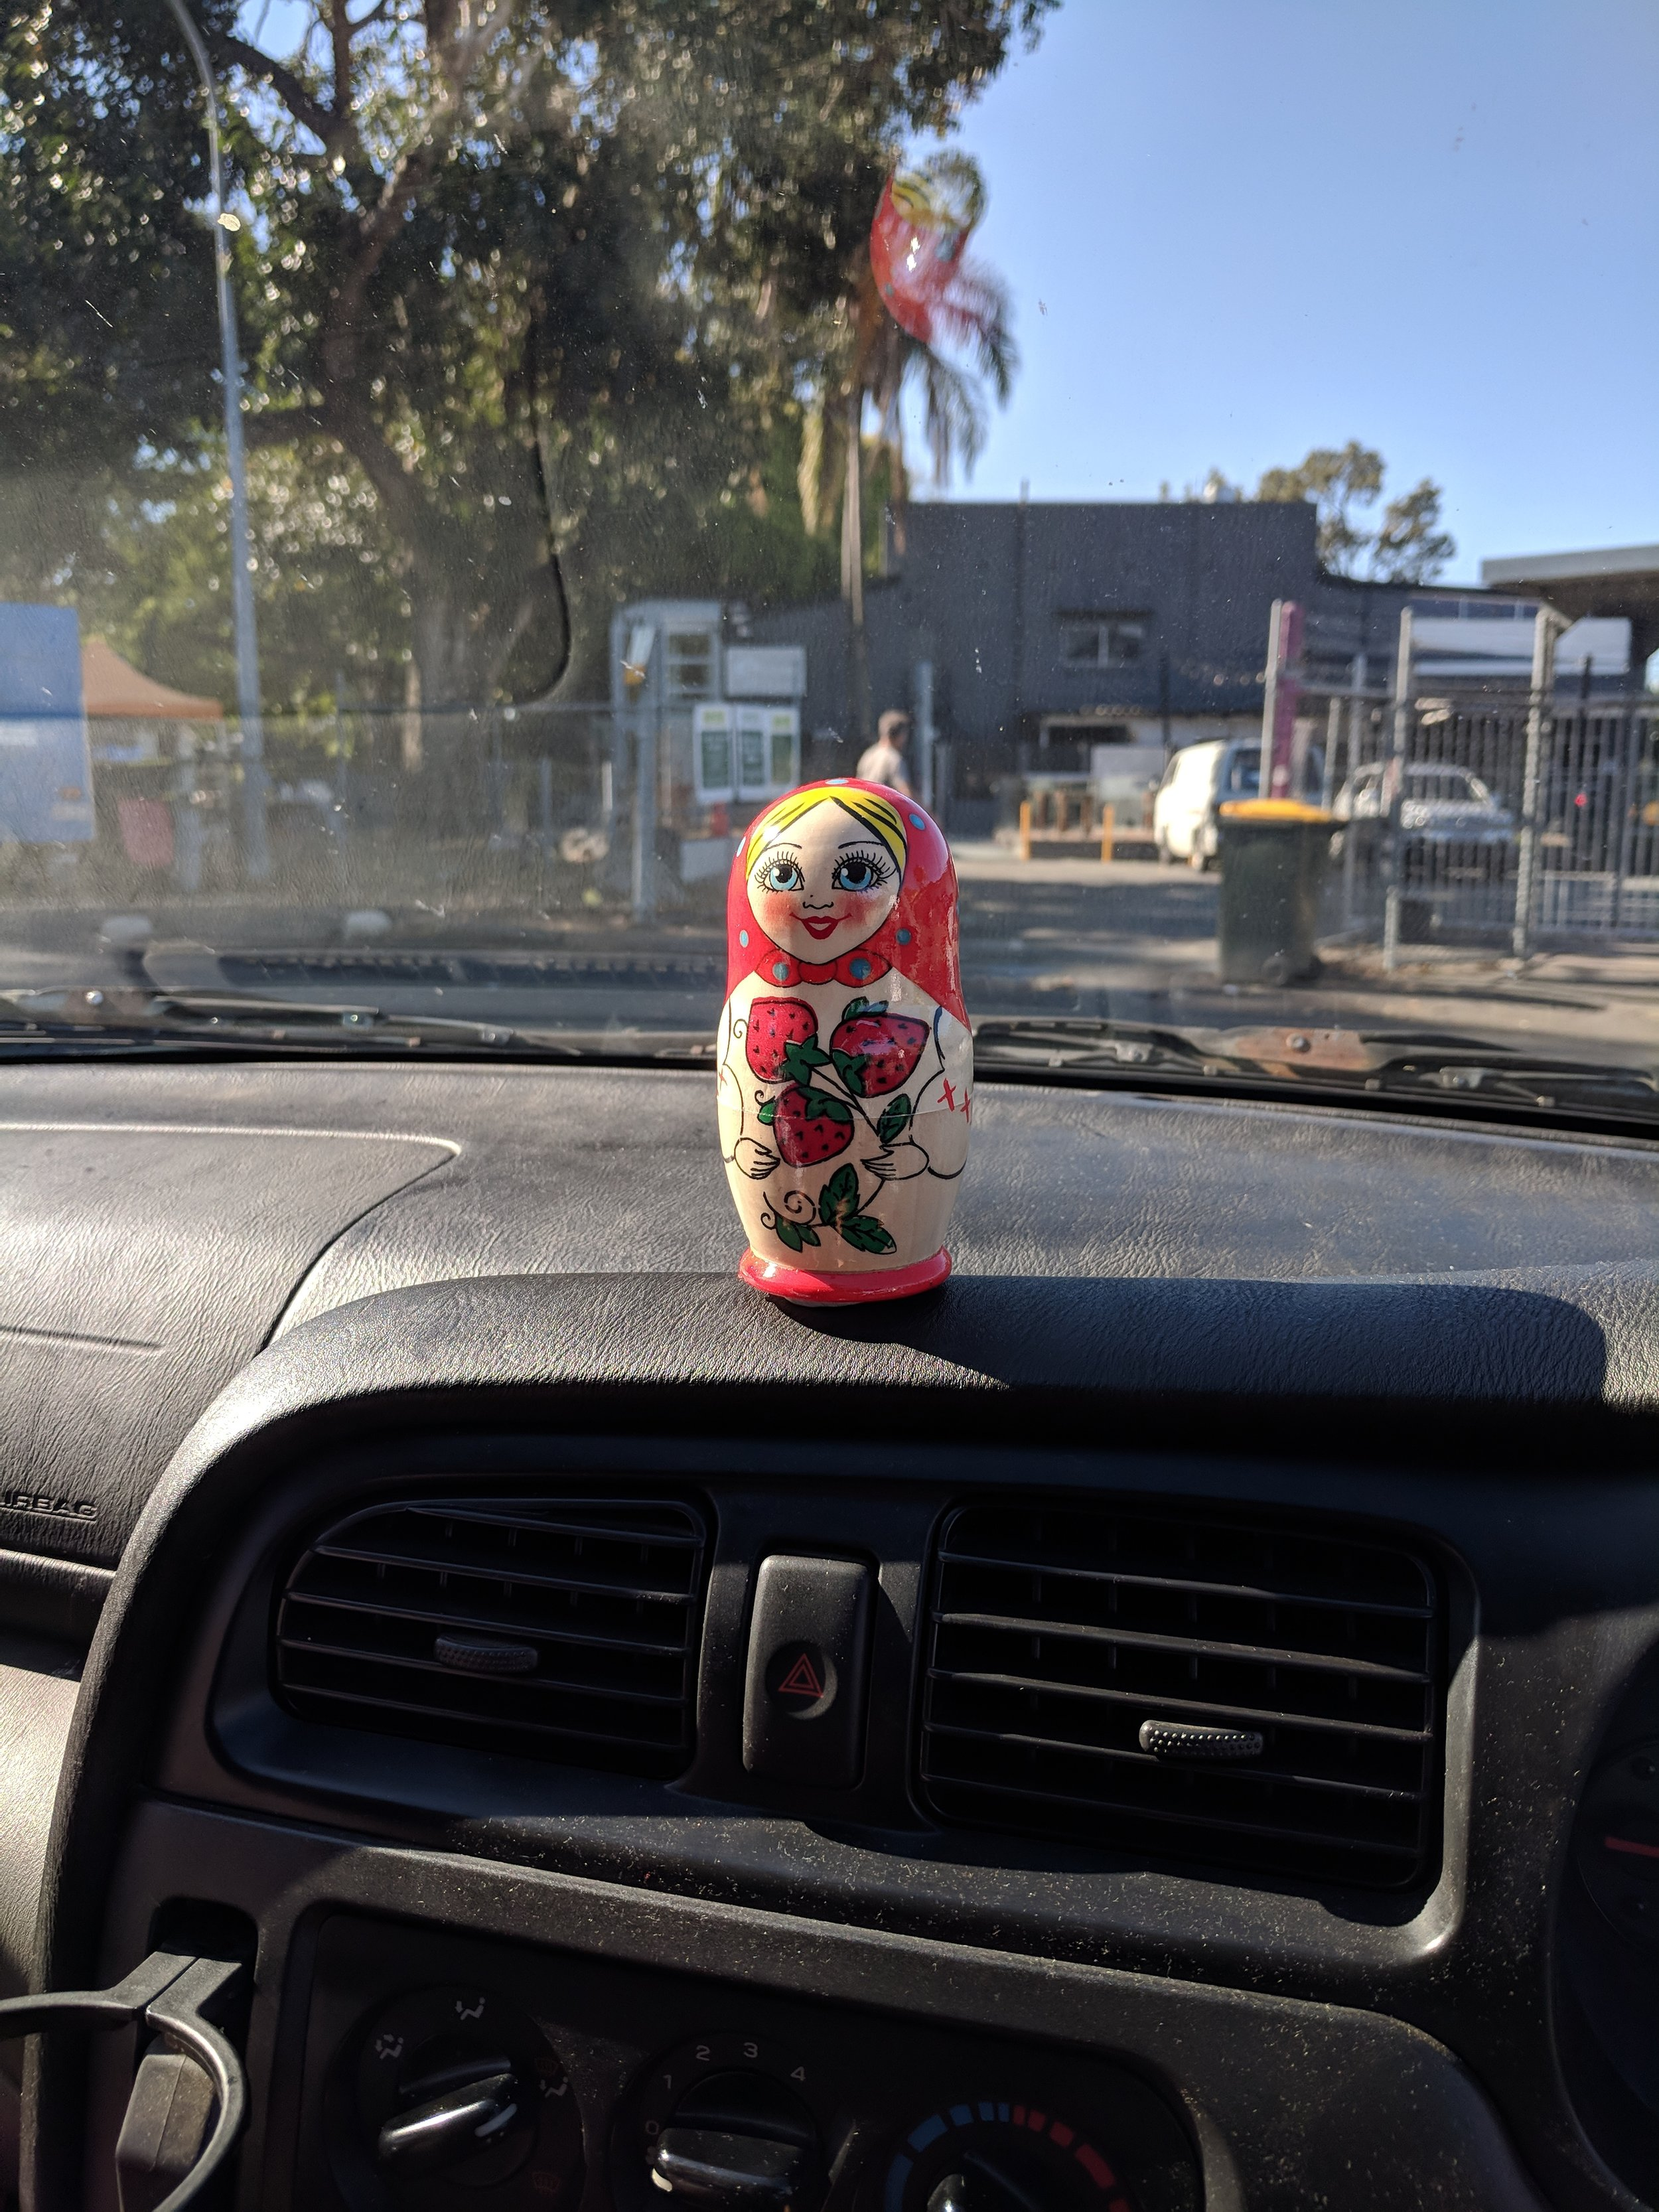 Sandra's gift/hood ornament/metaphor